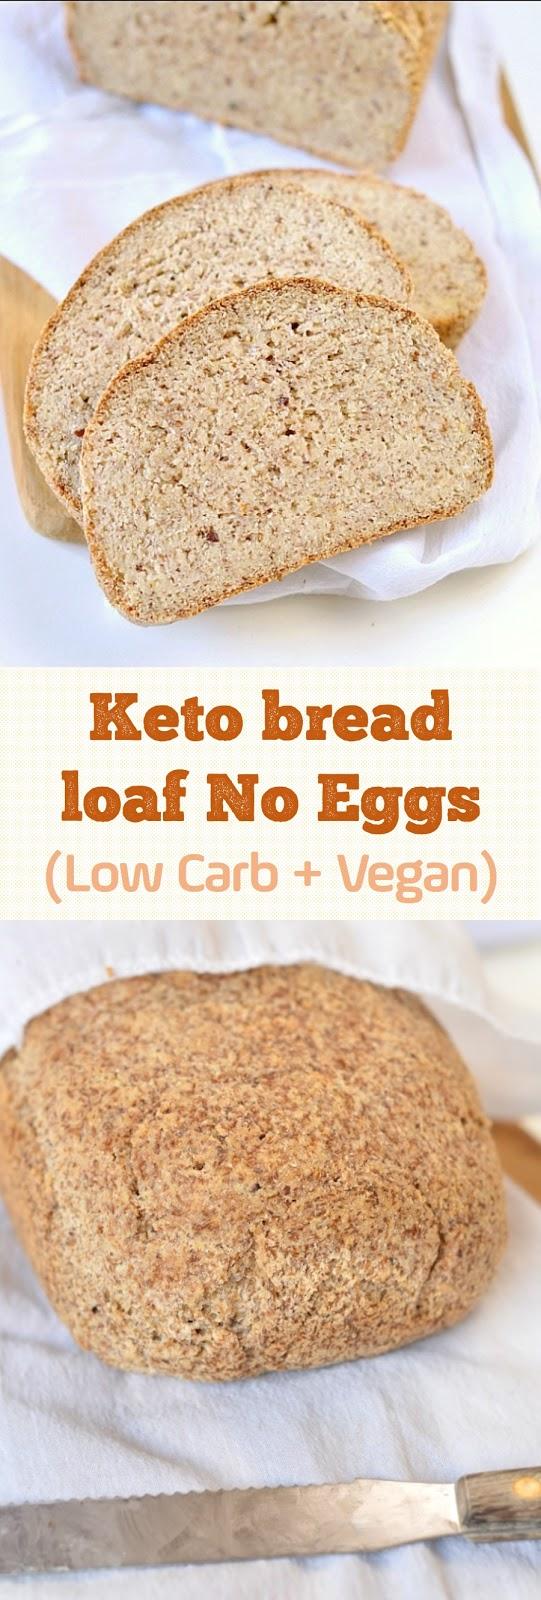 Low Carb Keto bread loaf No Eggs